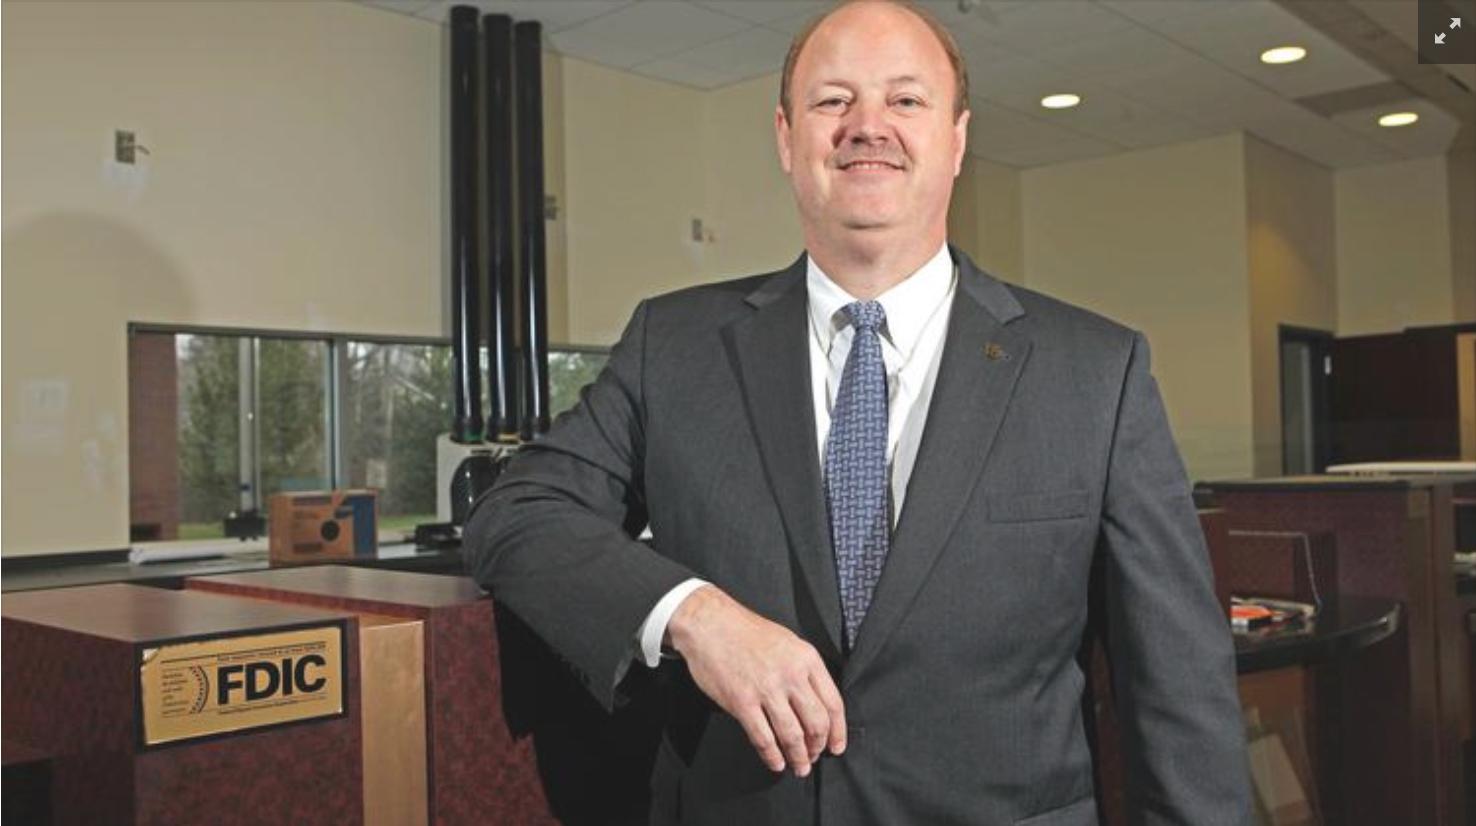 Daniel Reininga, president and CEO, Lake Shore Bancorp Inc.